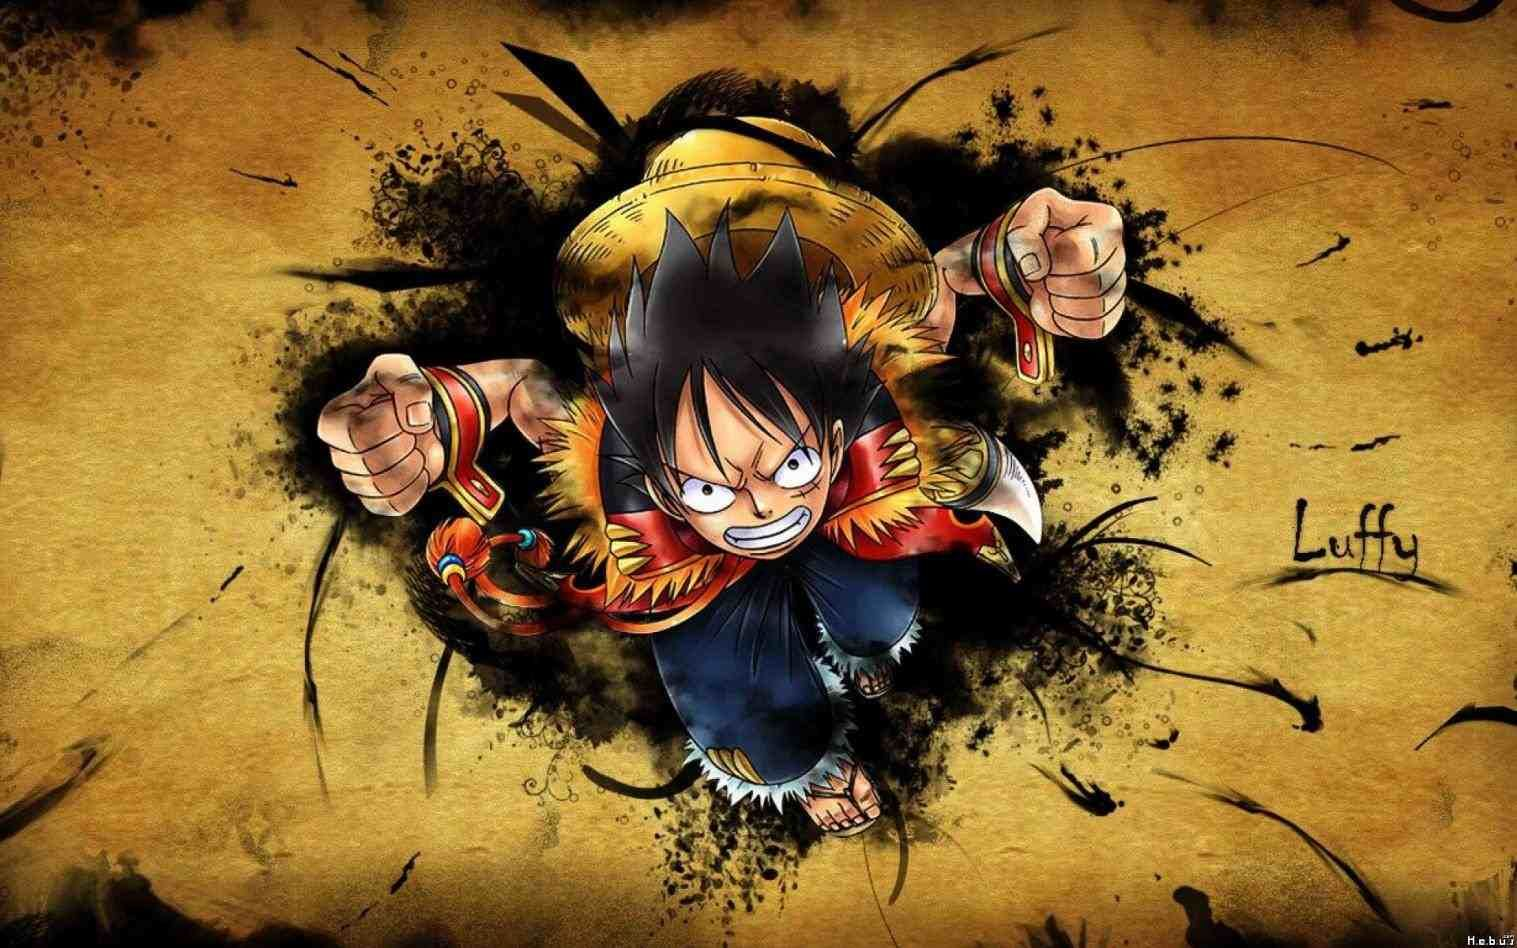 One Piece New World Luffy Wallpaper Gambar Gambar Anime Kartun